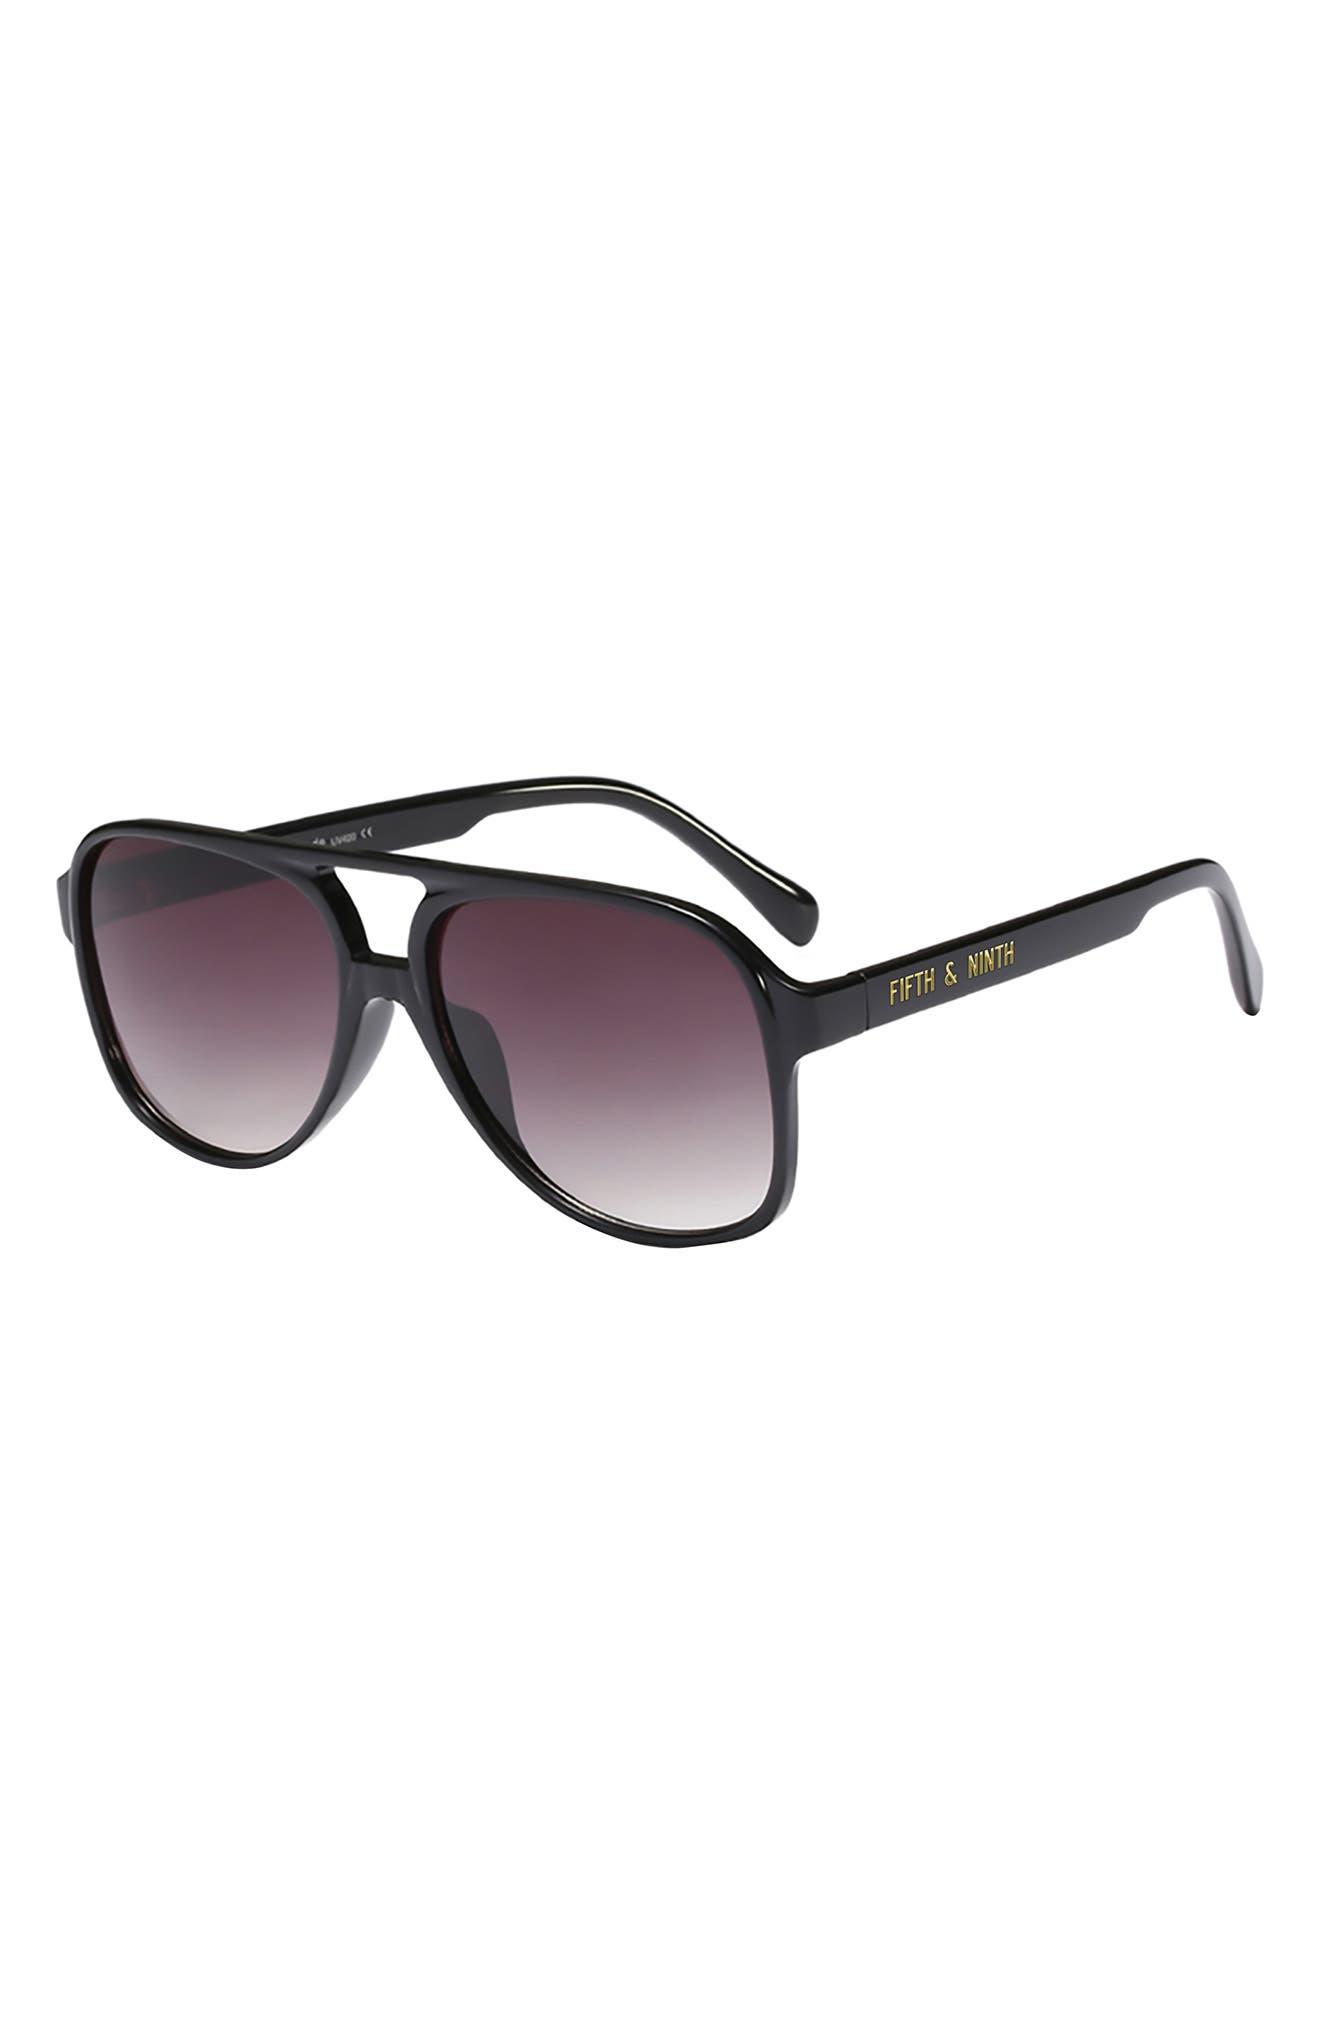 Kingston Aviator 60mm Oval Sunglasses